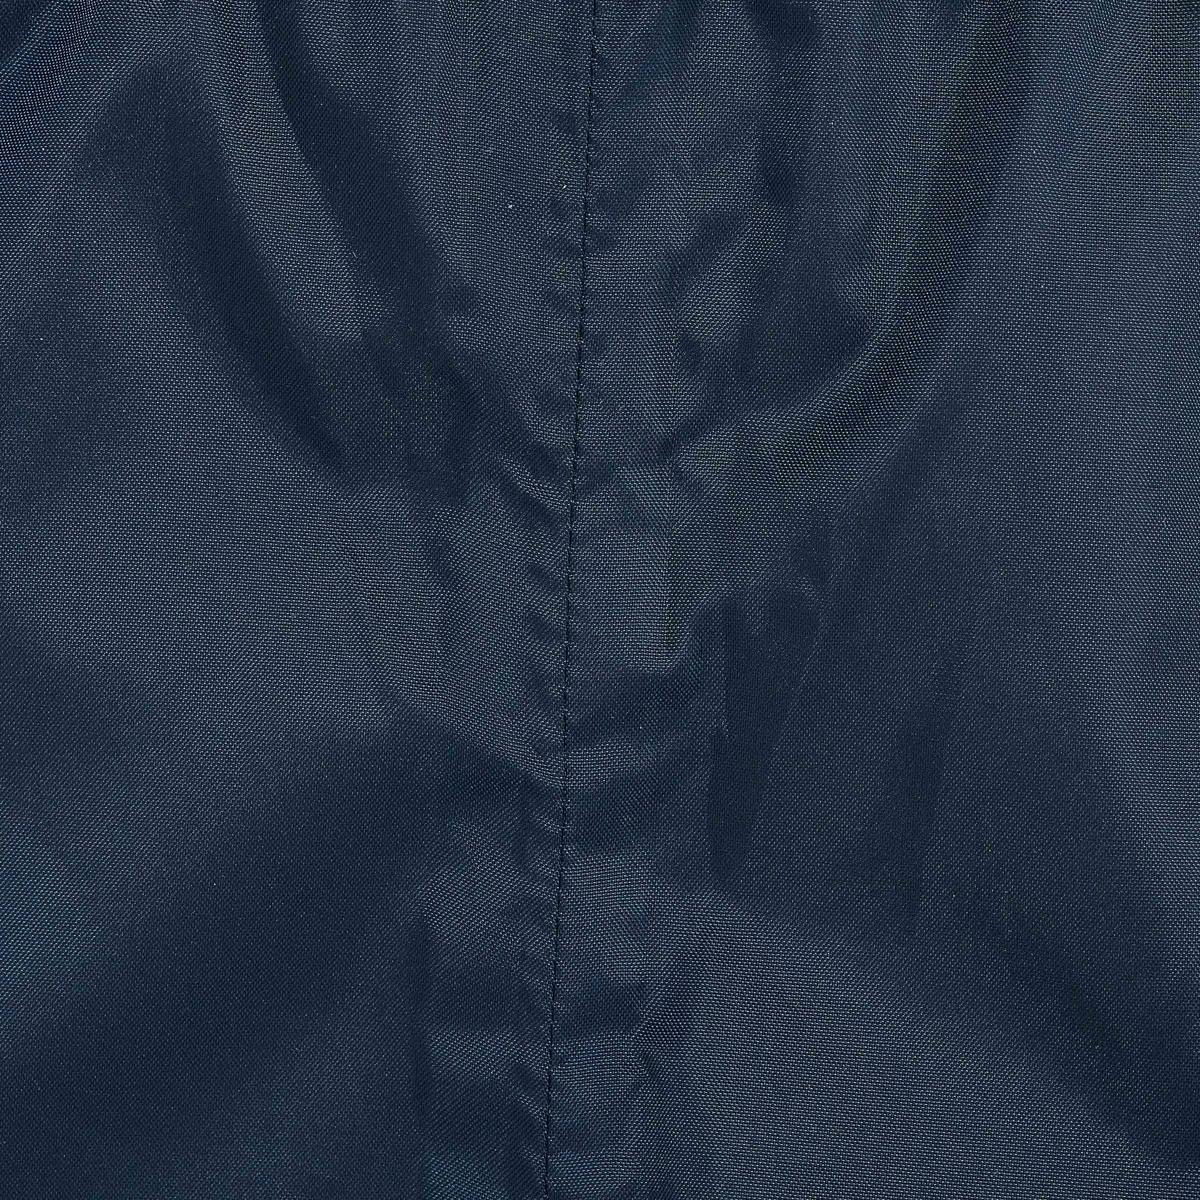 Bild 4 von Überziehhose Regenhose Hike 100 Kinder marineblau